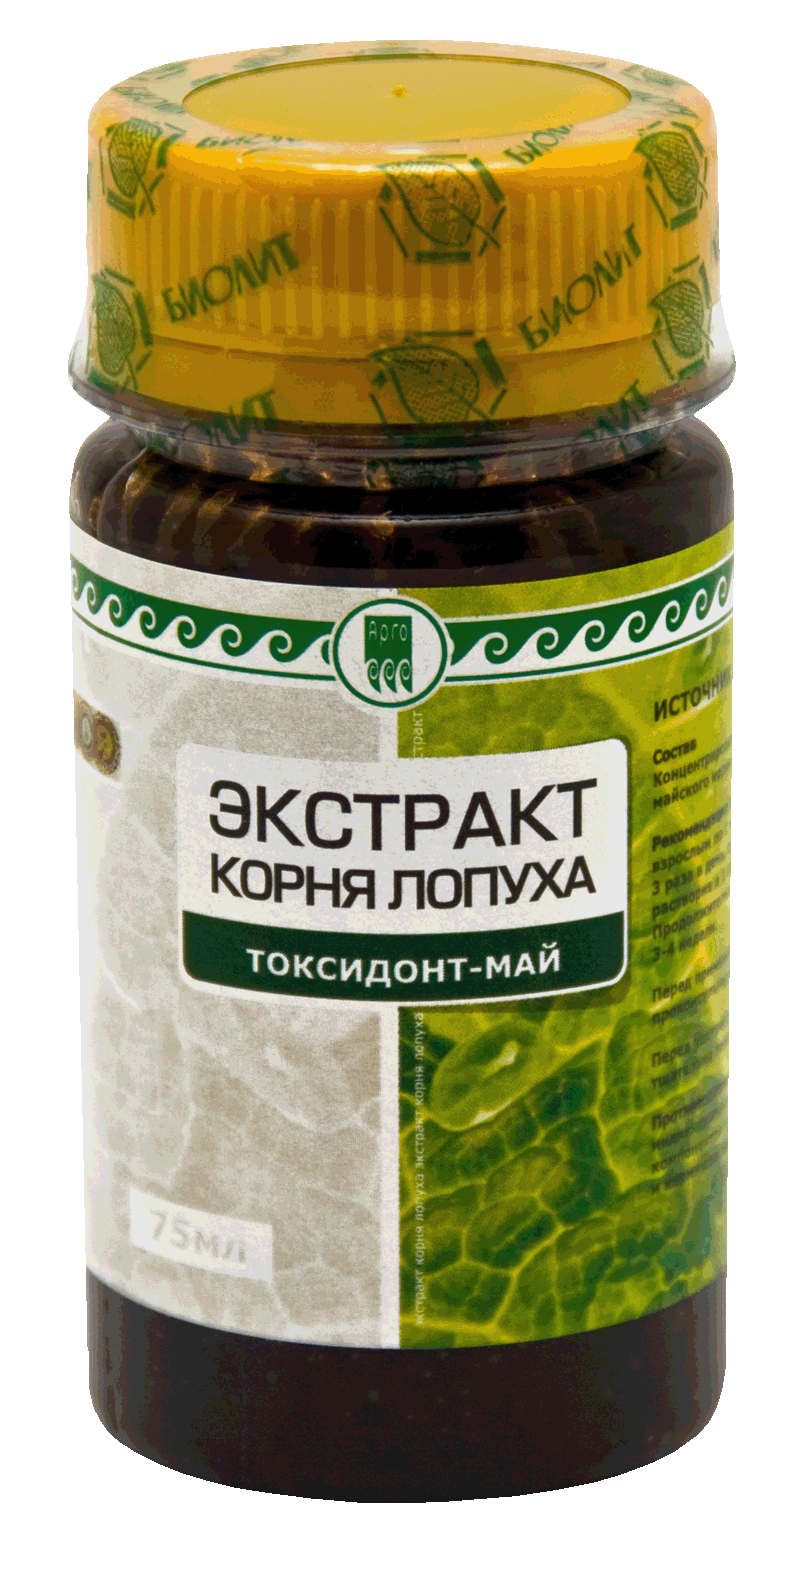 Токсидонт-май